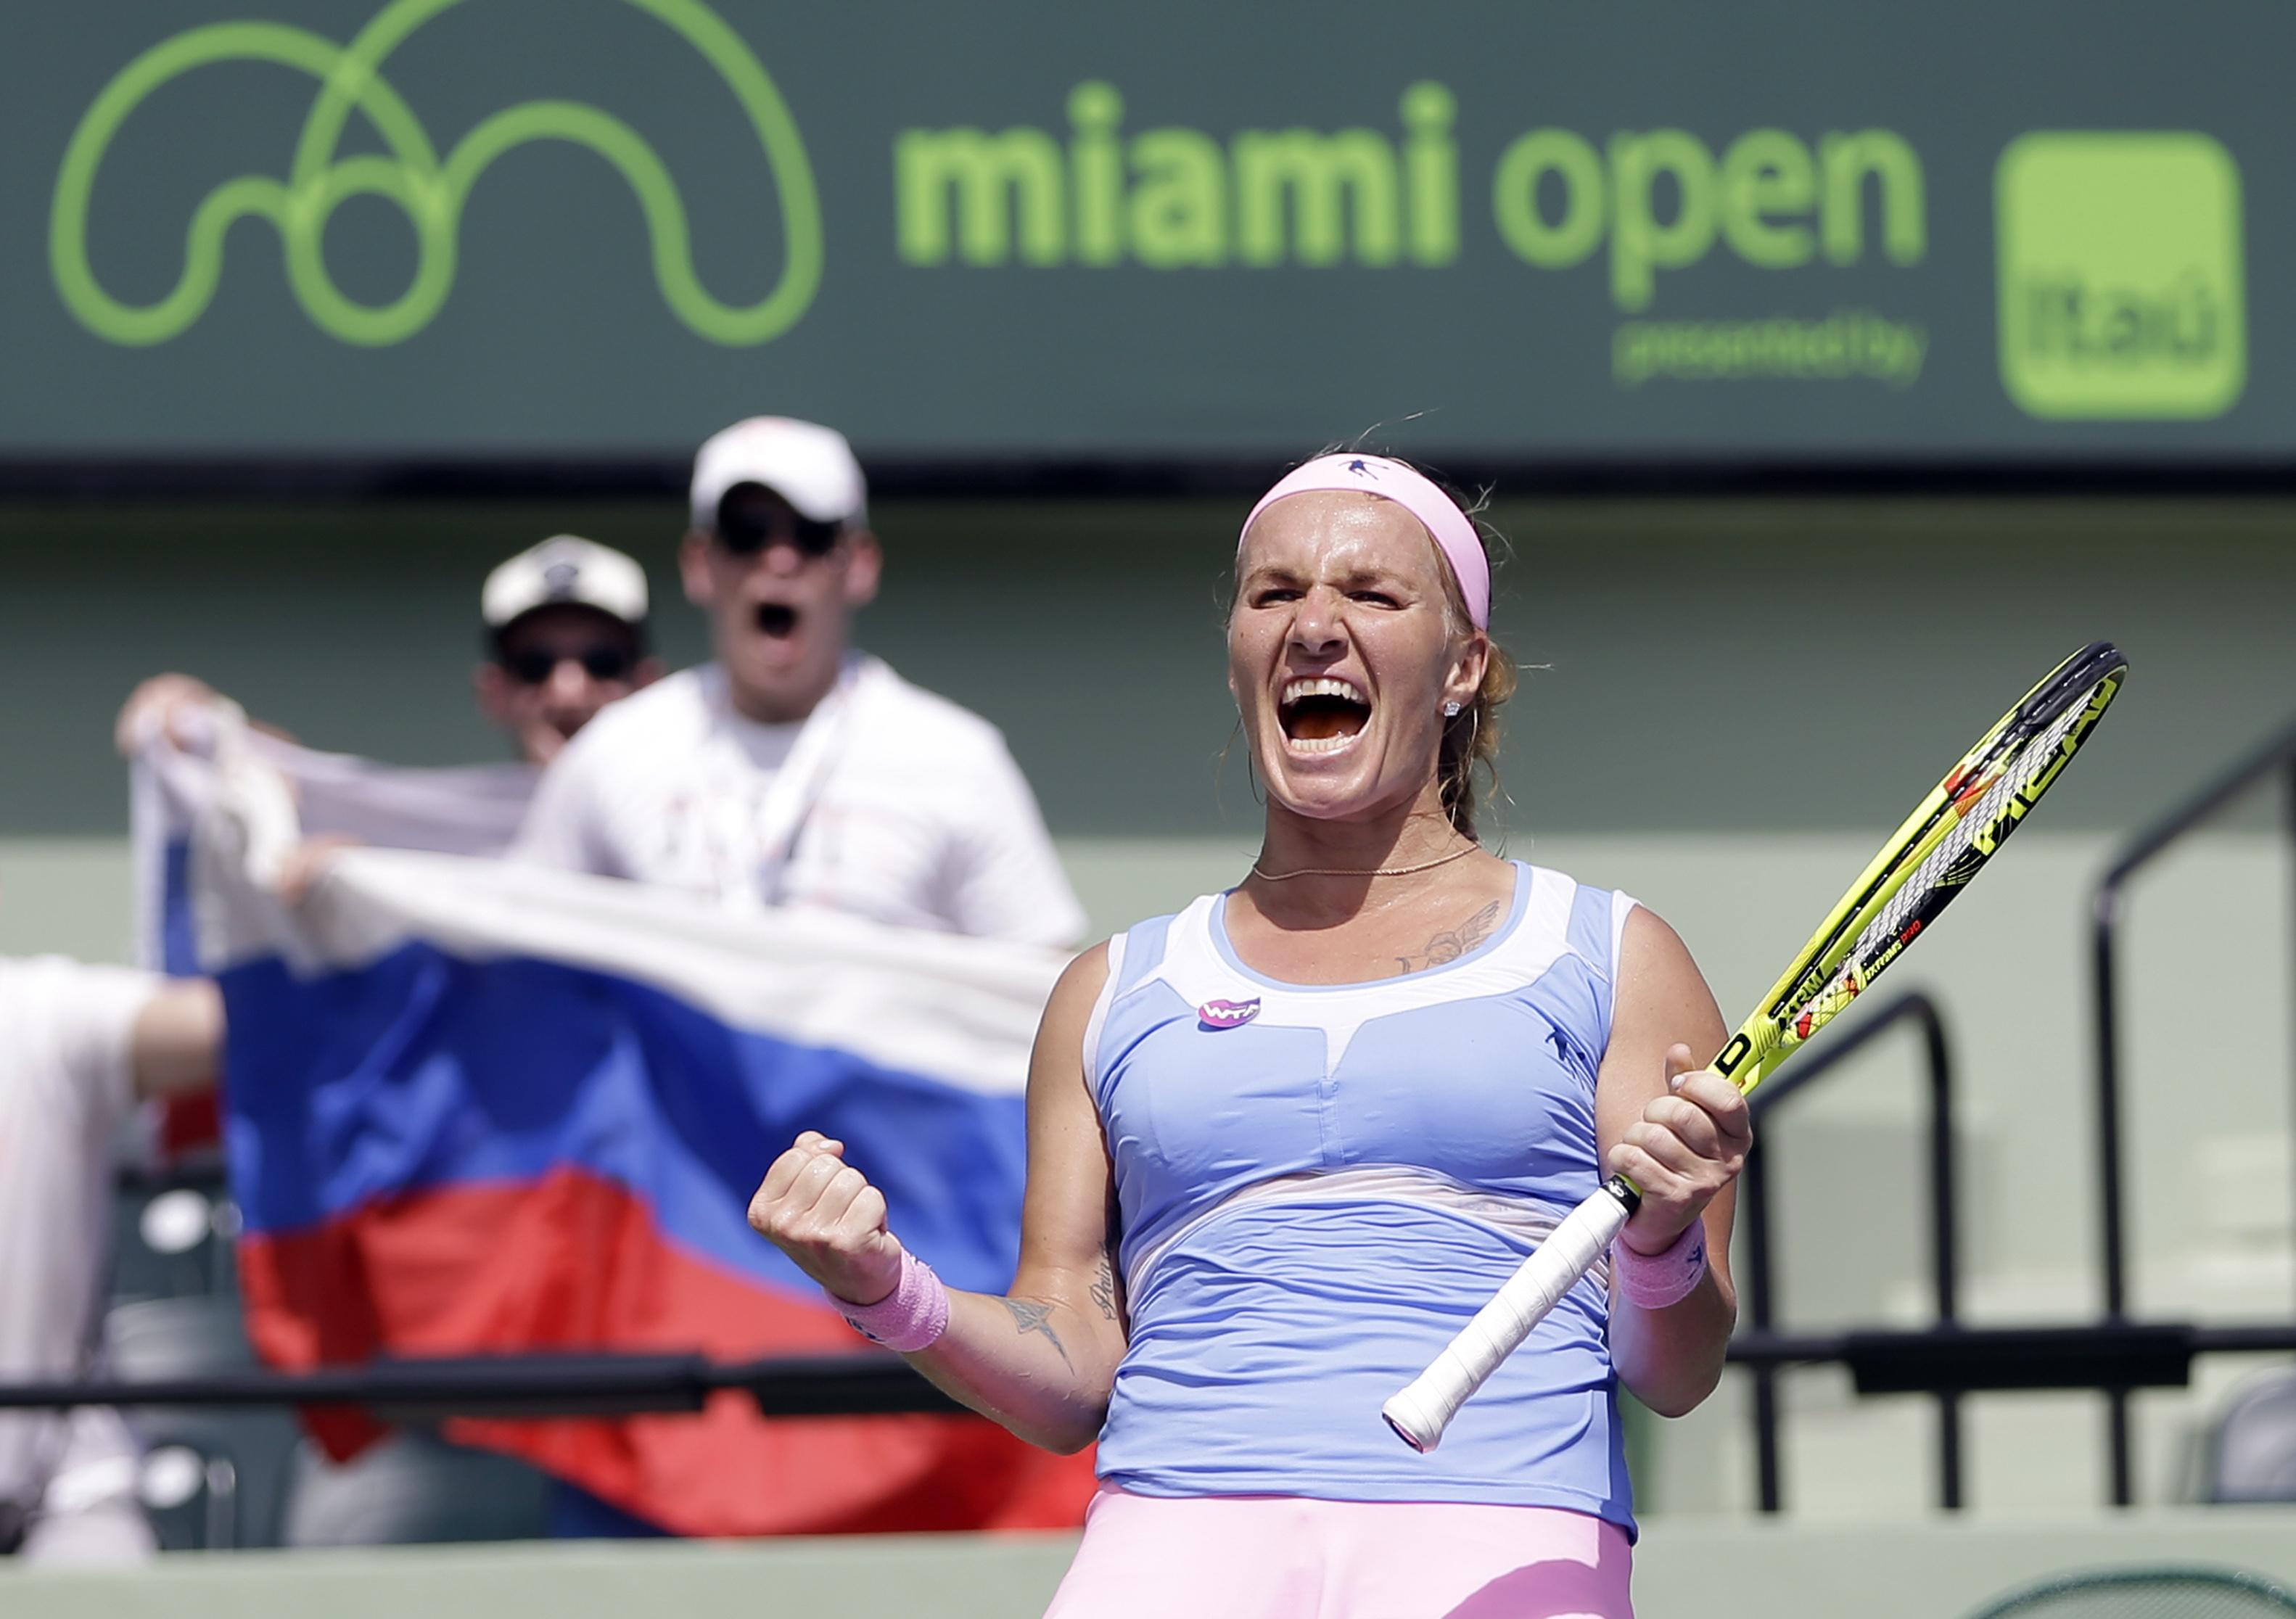 Svetlana Kuznetsova, of Russia, celebrates after winning 7-5, 6-3, against Timea Bacsinszky, of Switzerland, during the Miami Open tennis tournament in Key Biscayne, Fla., Thursday, March 31, 2016. (AP Photo/Alan Diaz)